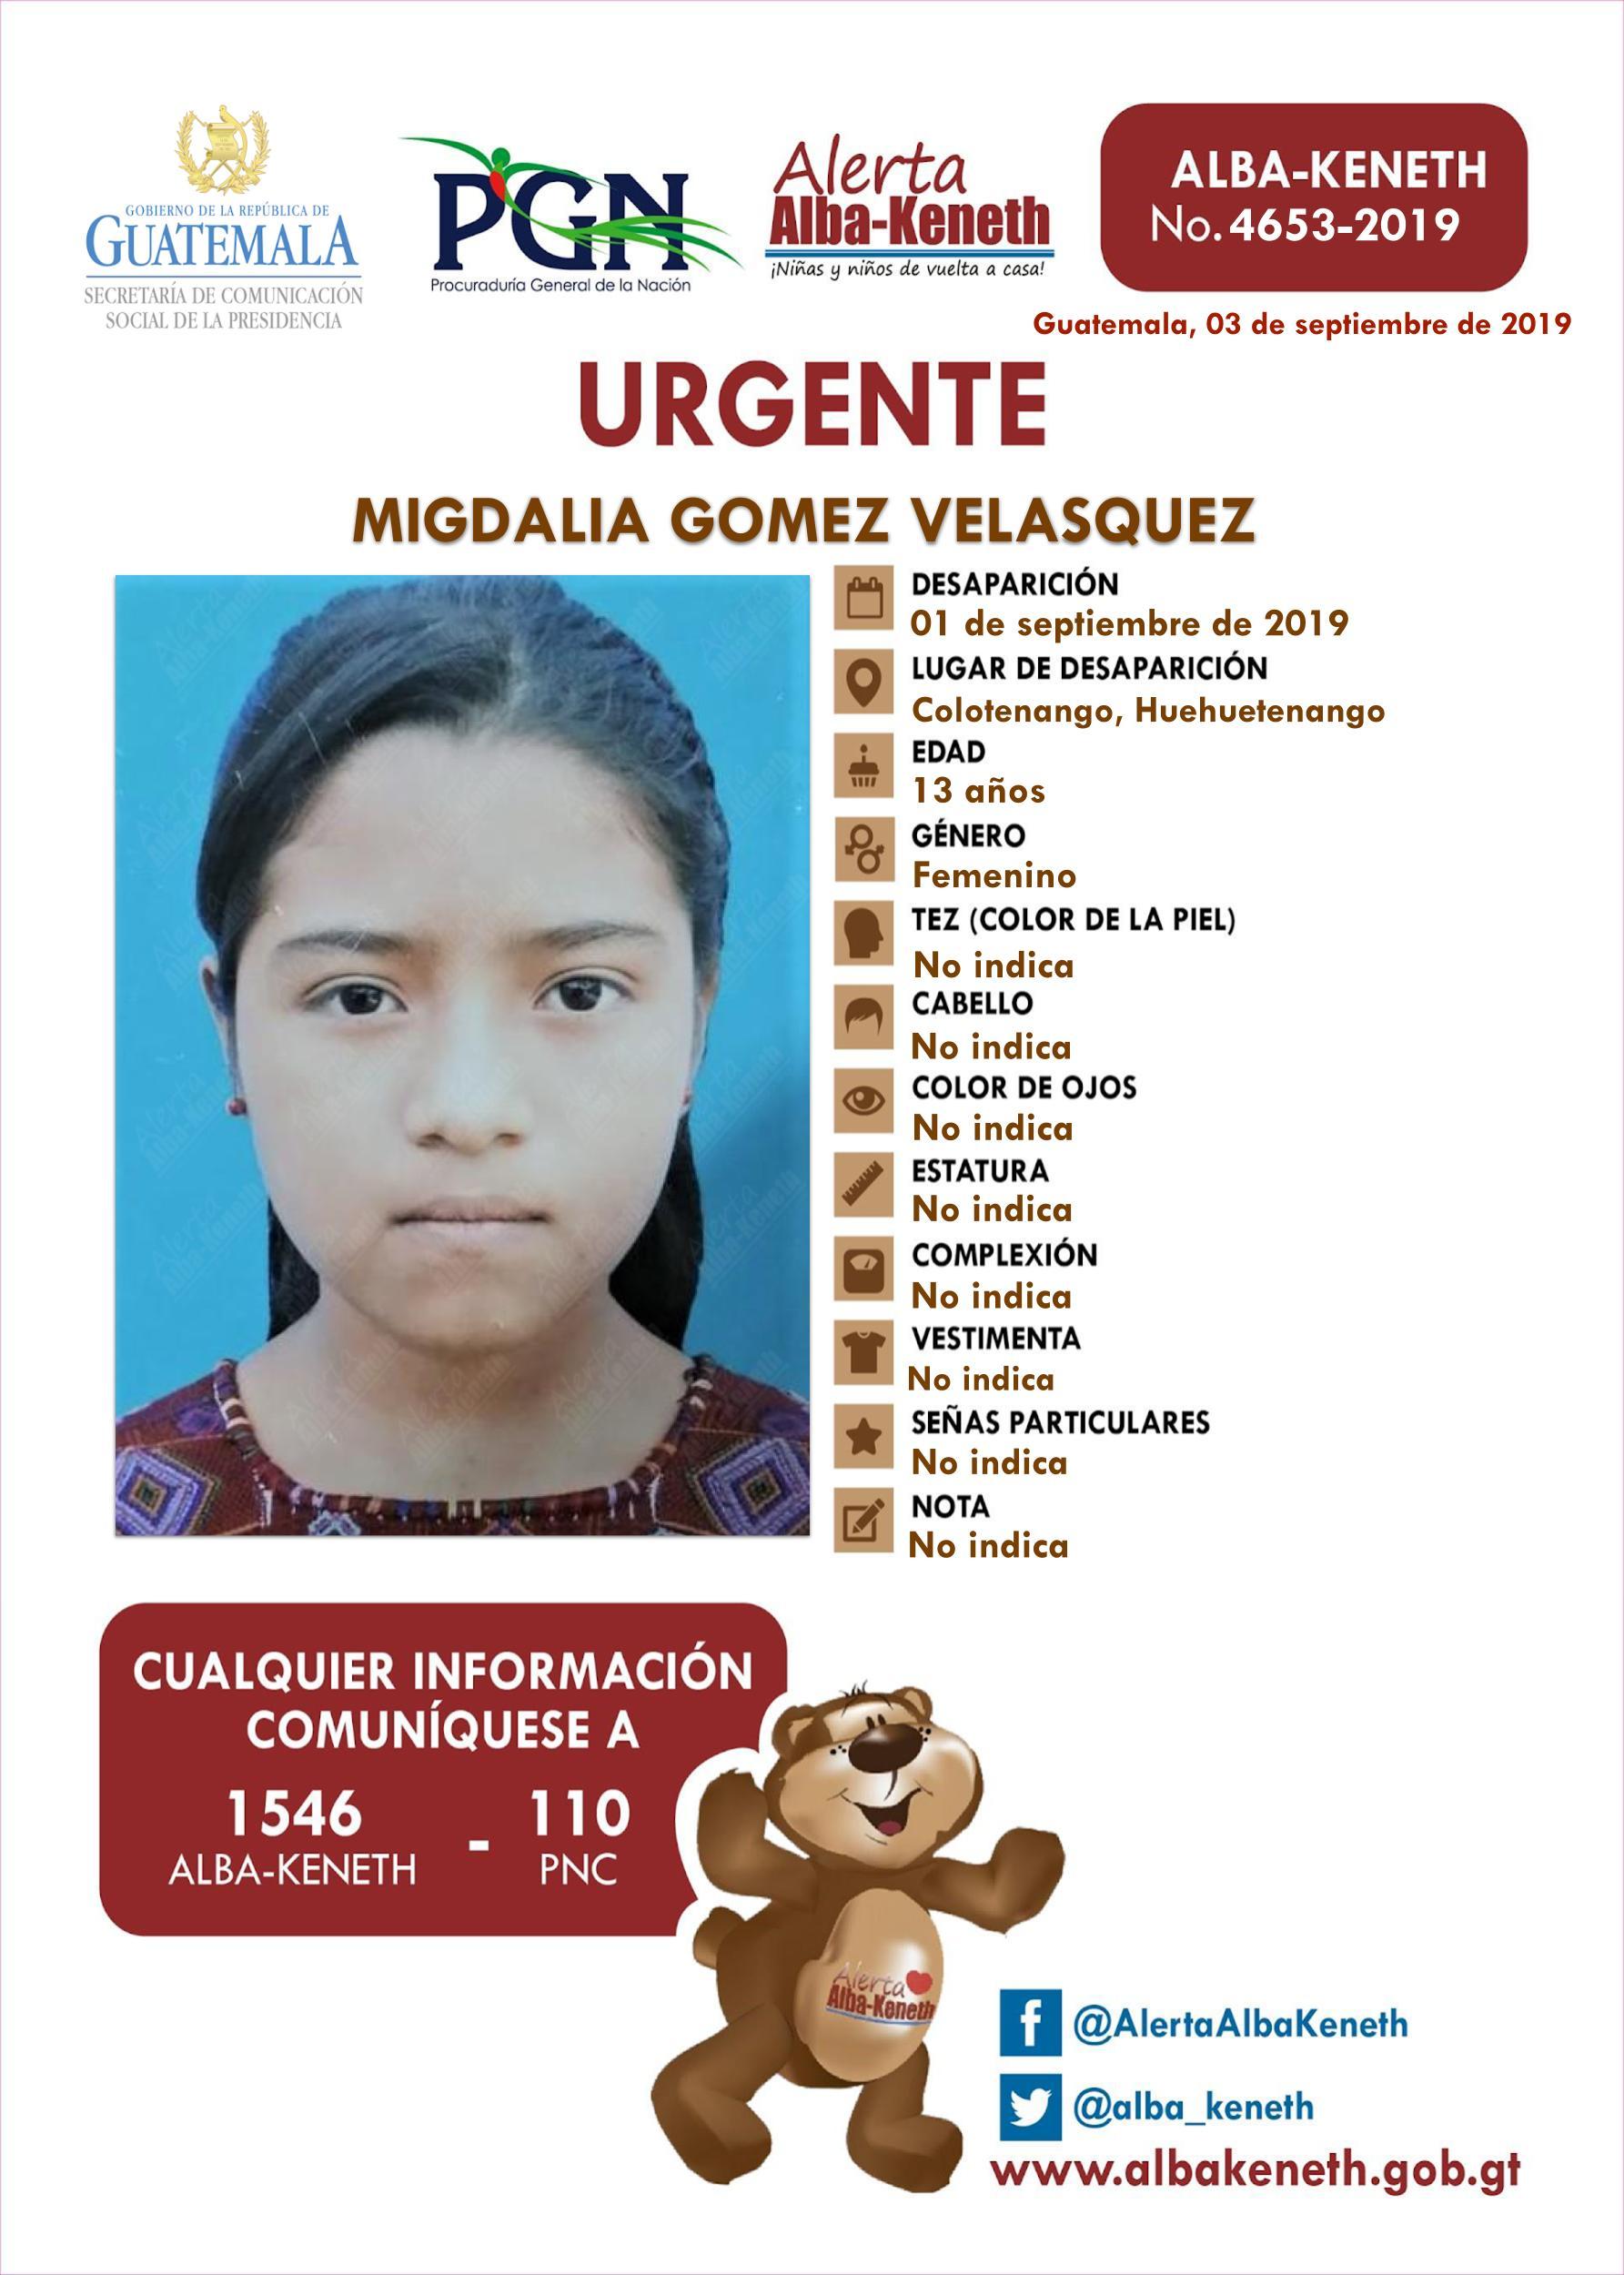 Migdalia Gomez Velasquez